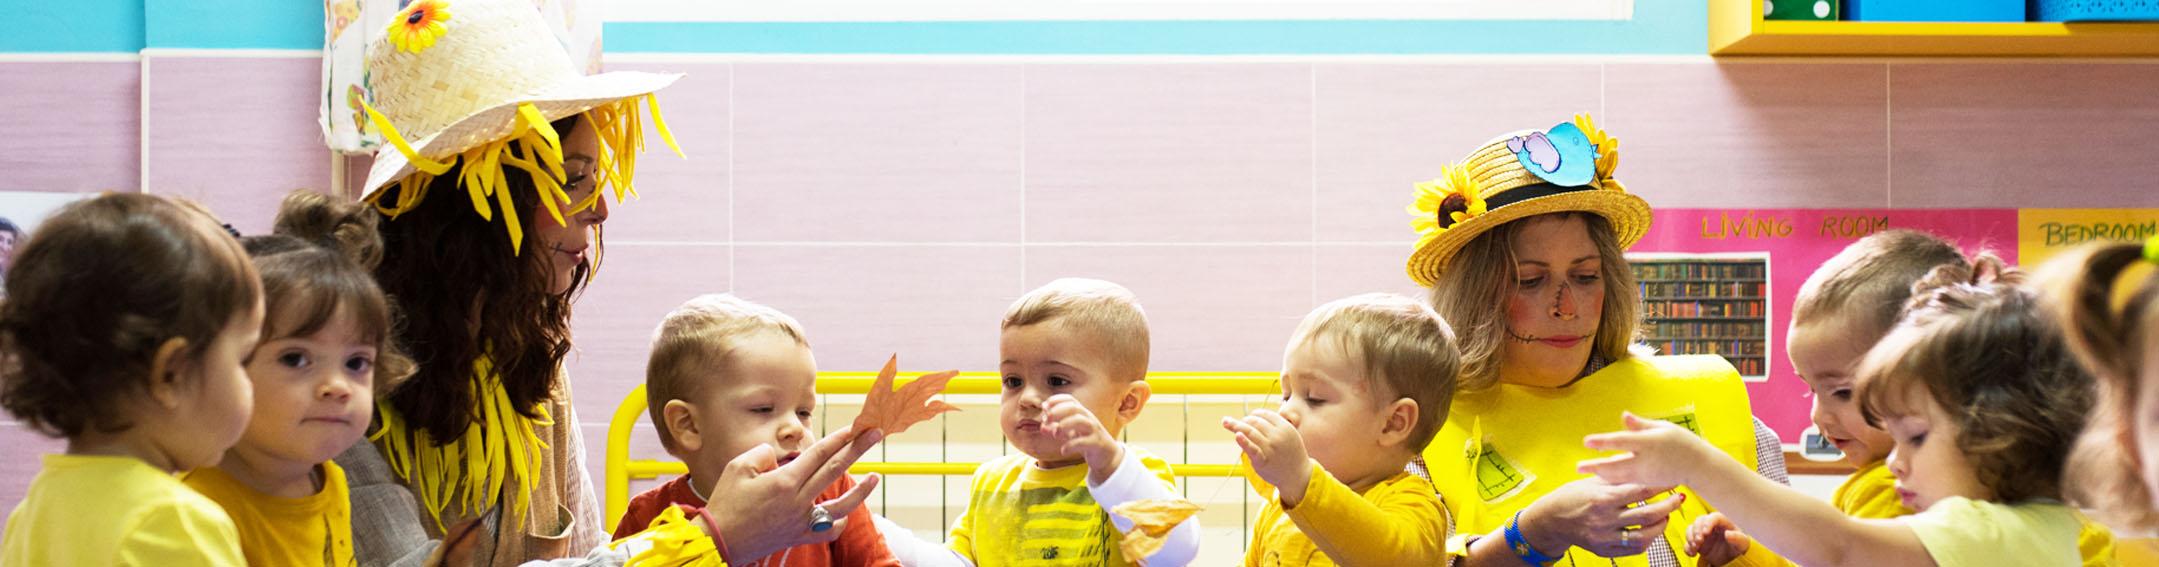 proyecto educativo guarderia dalmatas mostoles